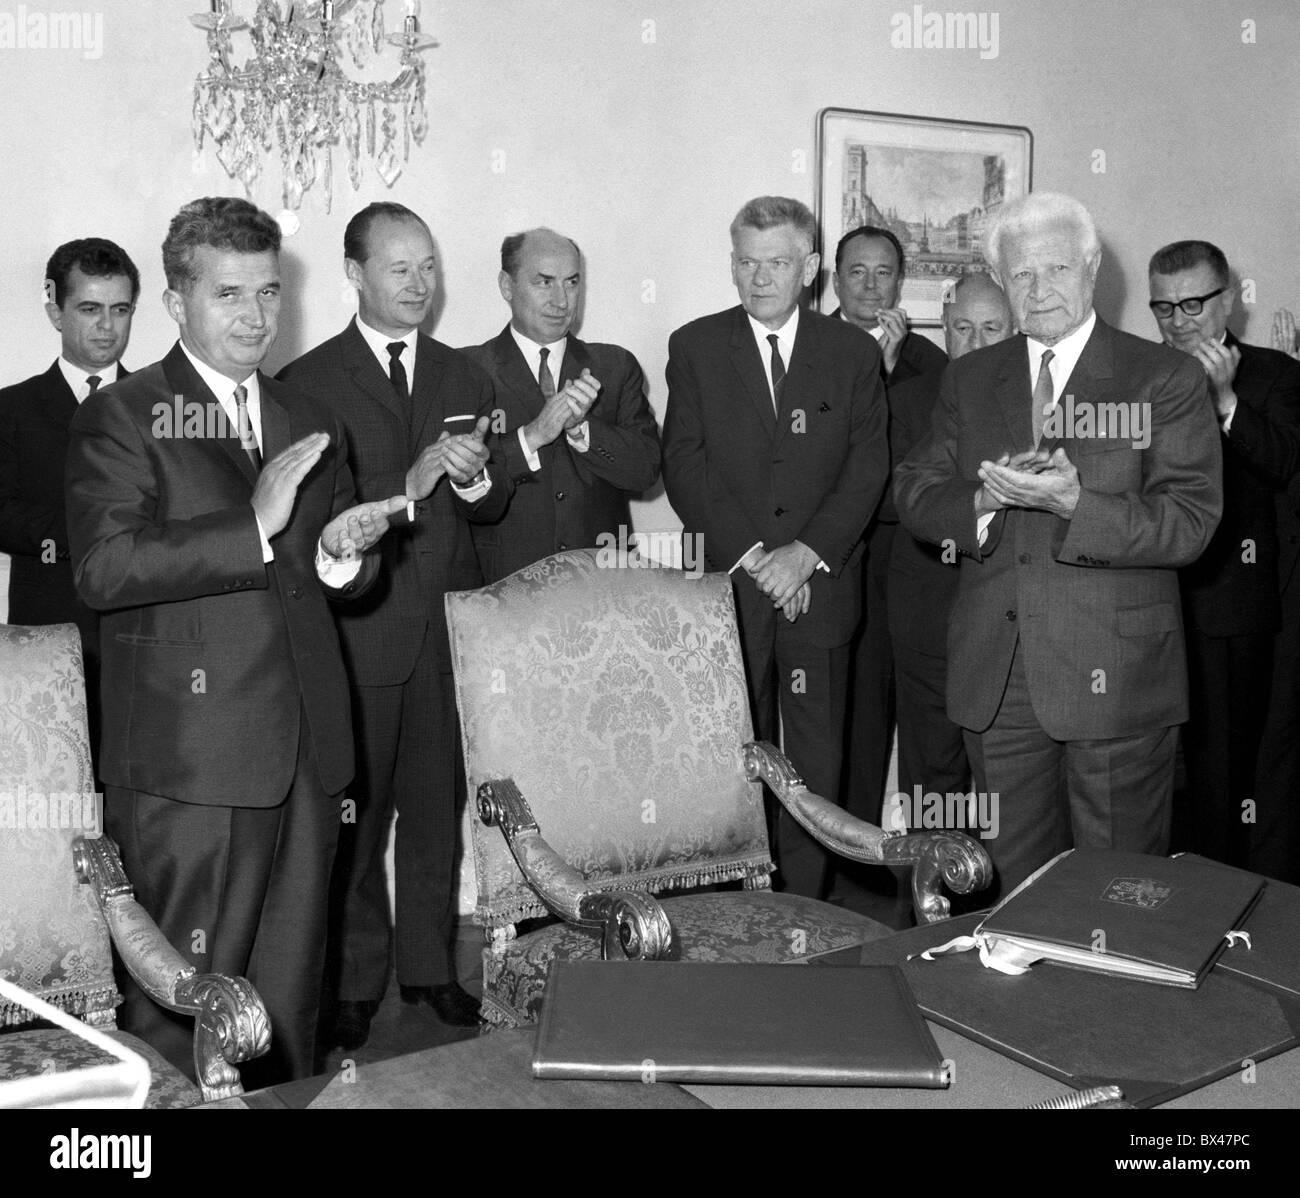 Nicolae Ceausescu, Alexander Dubcek, Ludvik Svoboda, Oldrich Cernik, Josef Smrkovsky, Frantisek Kriegel, Cestmir Cisar, treaty, Stock Photo